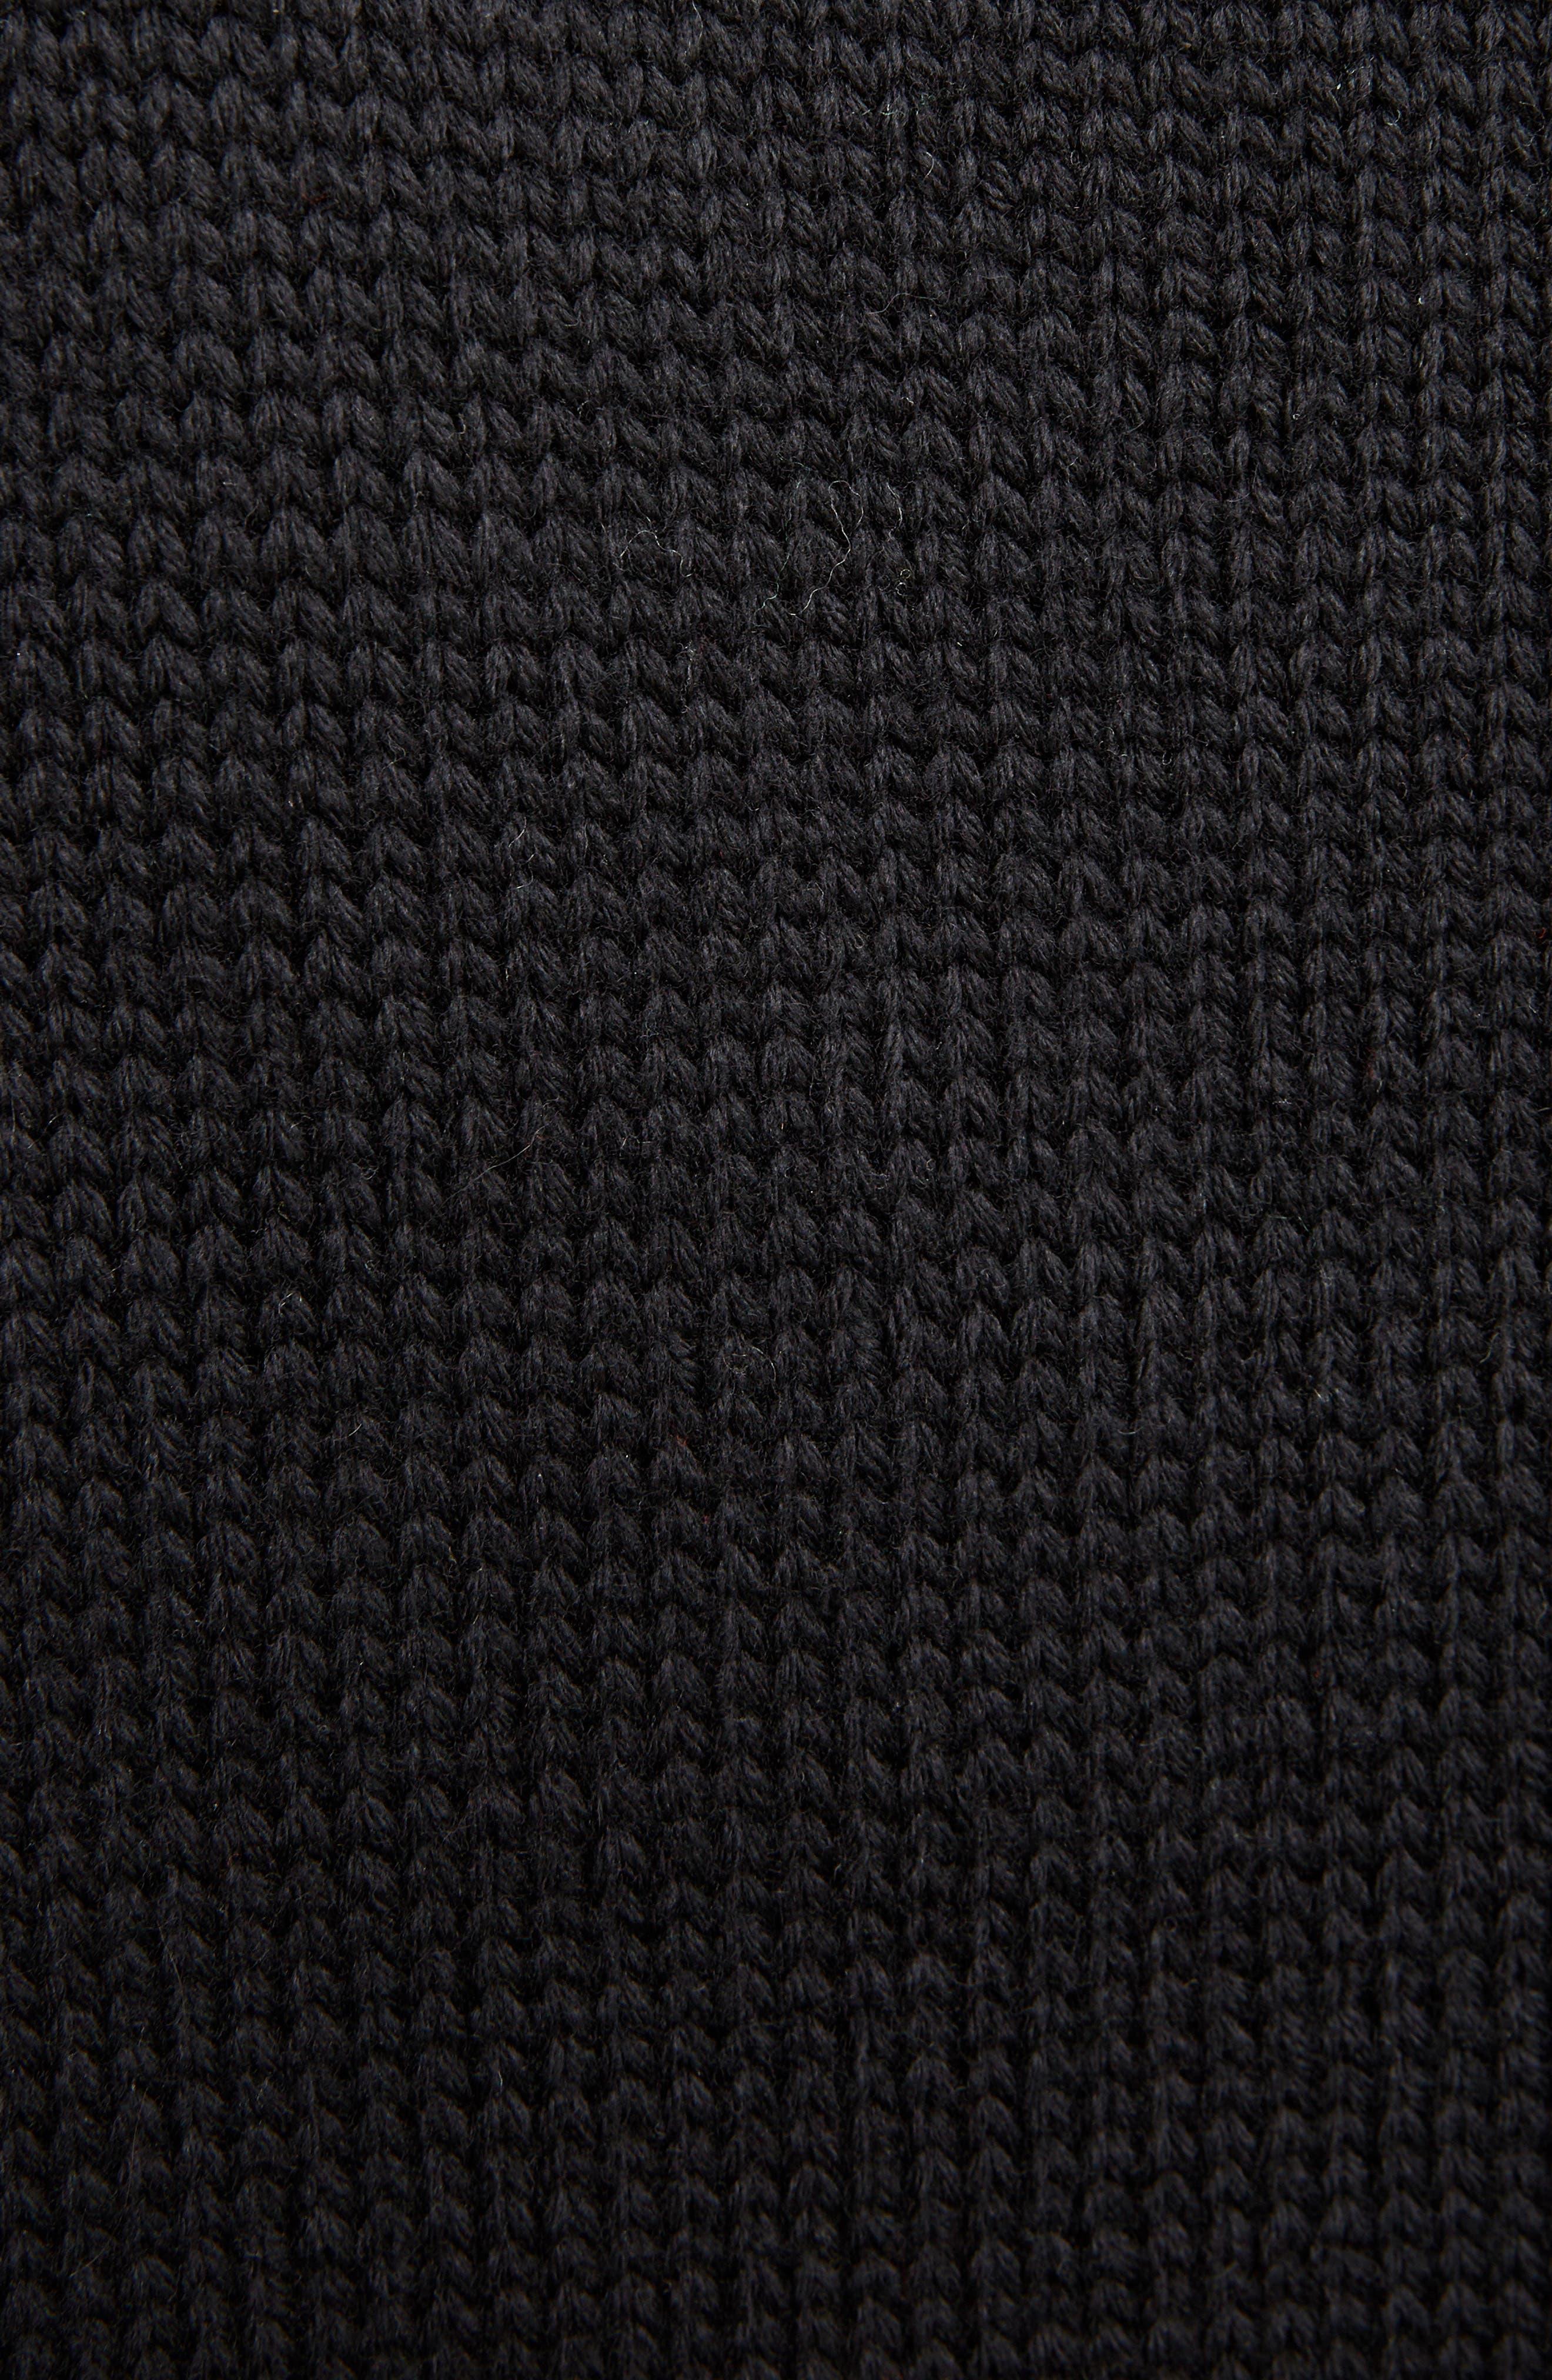 Palm Lady Sweater Tank,                             Alternate thumbnail 5, color,                             Black